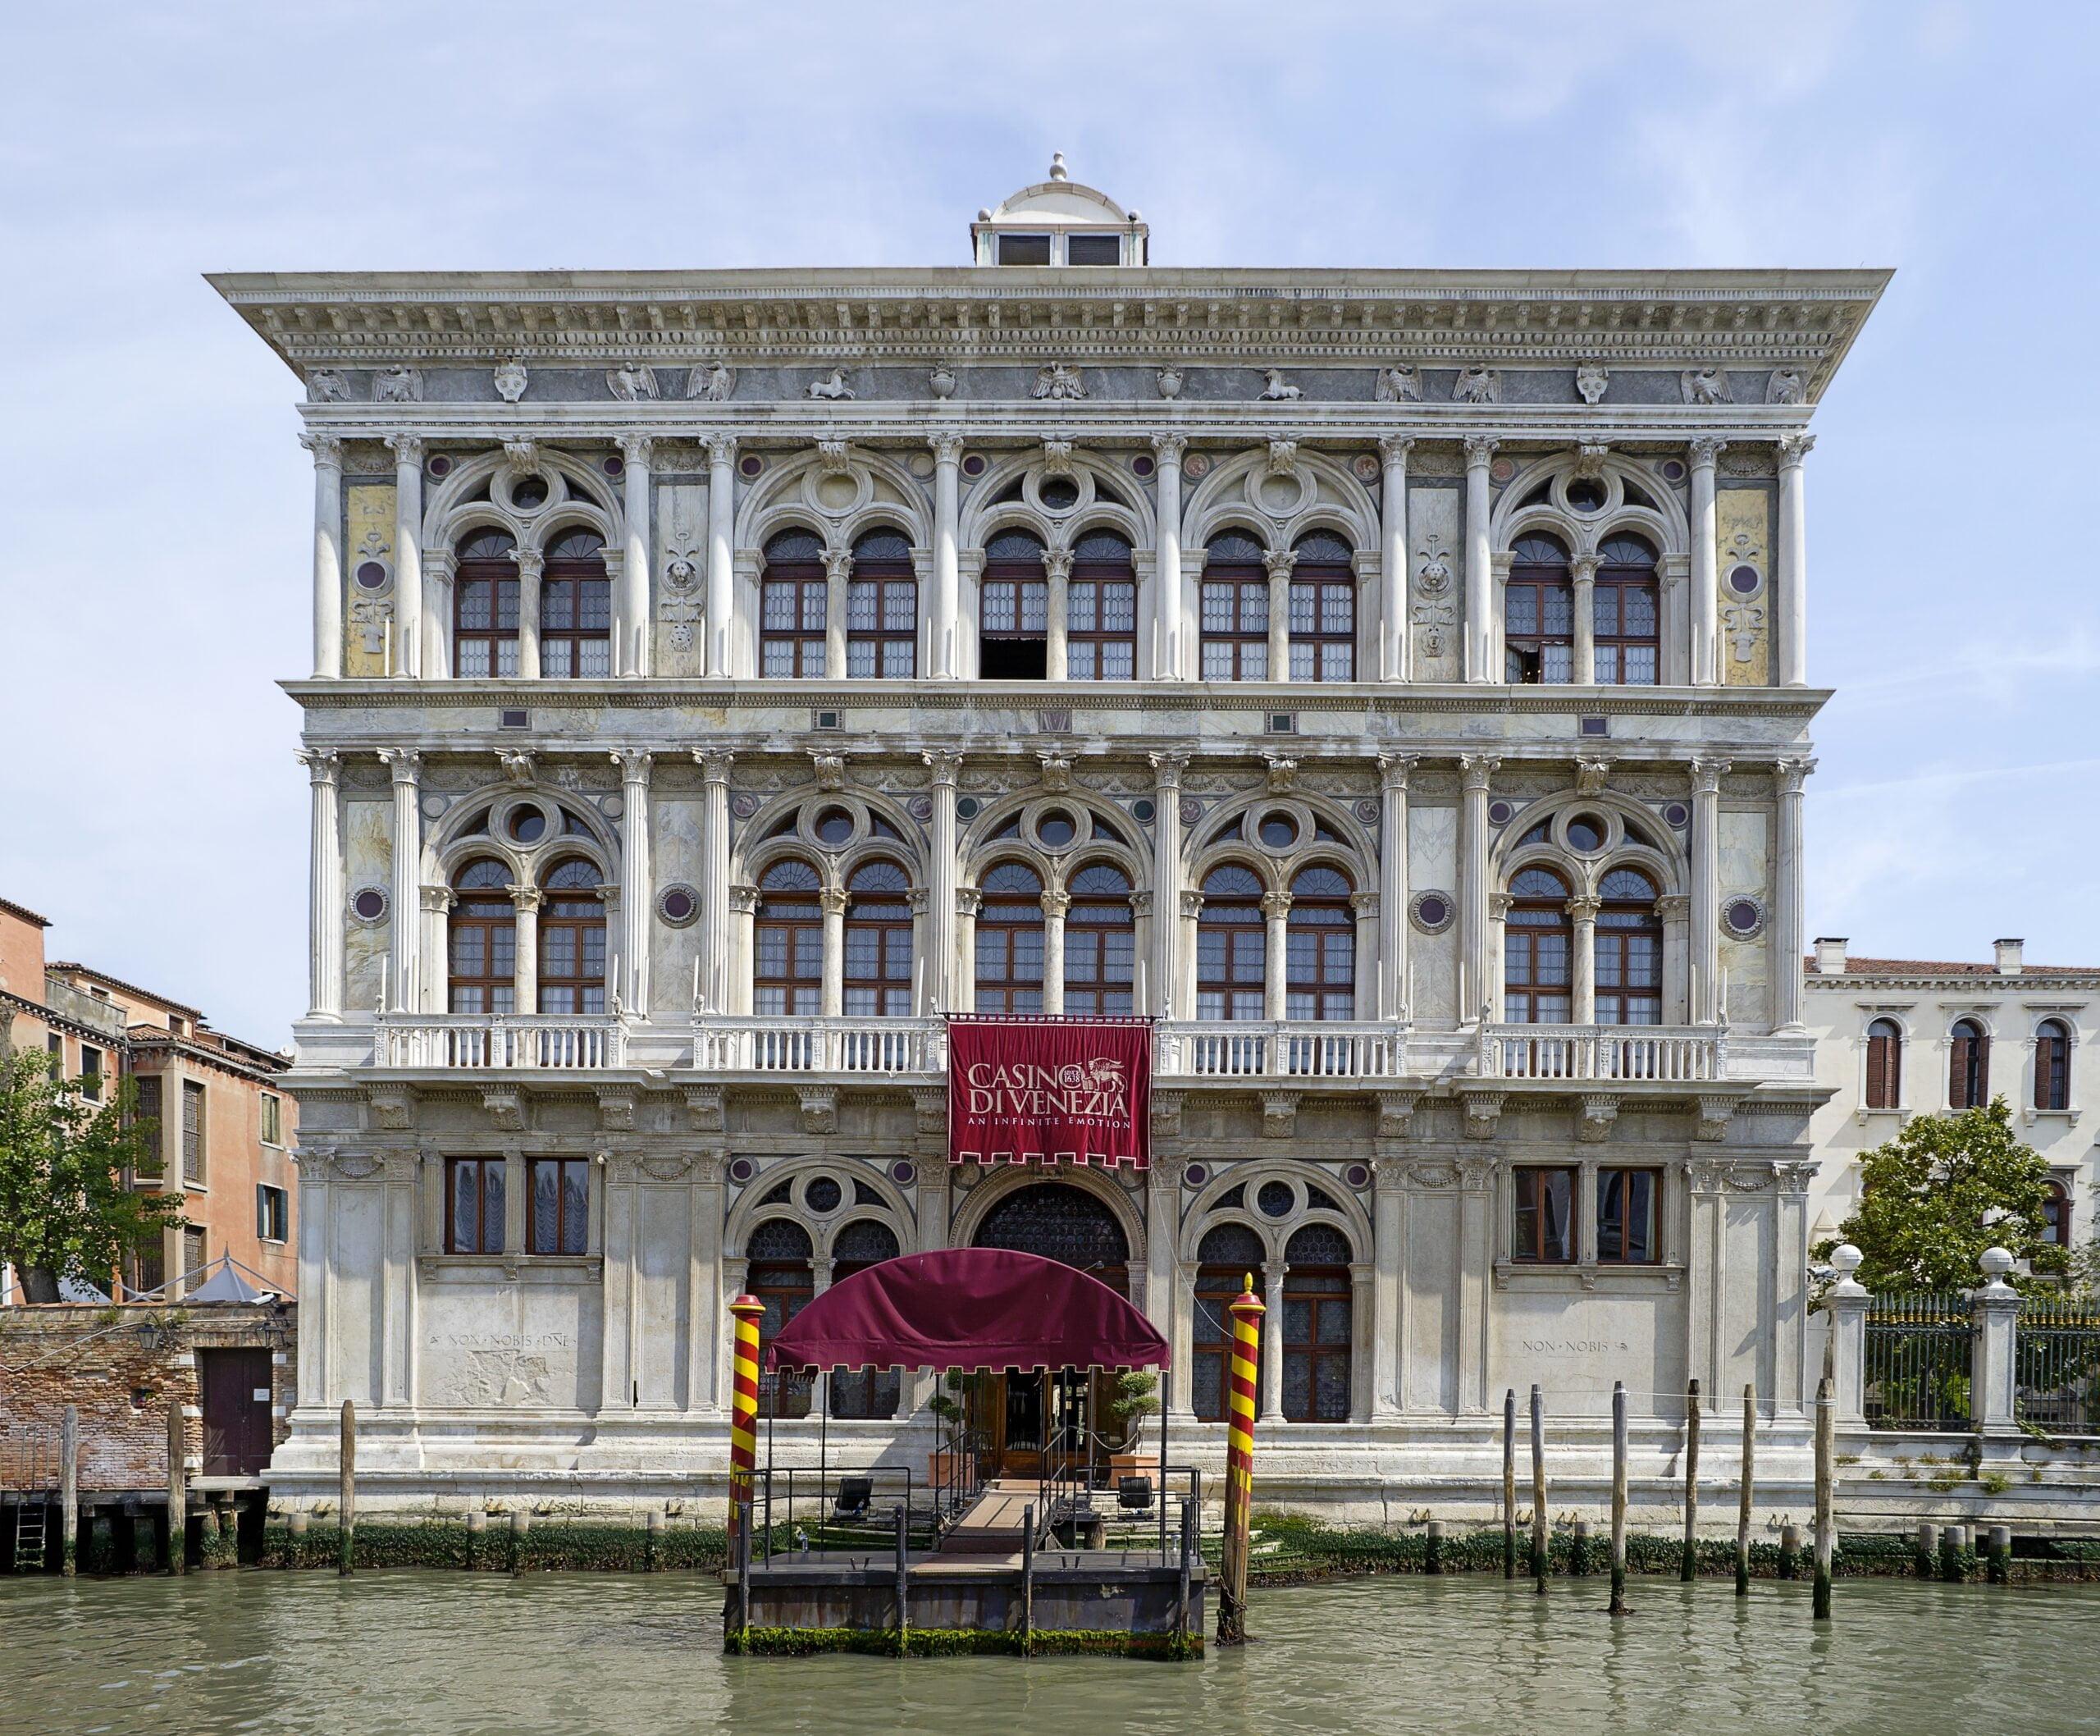 Venice Casino, Venice - Photo by Didier Descouens under CC BY-SA 4.0